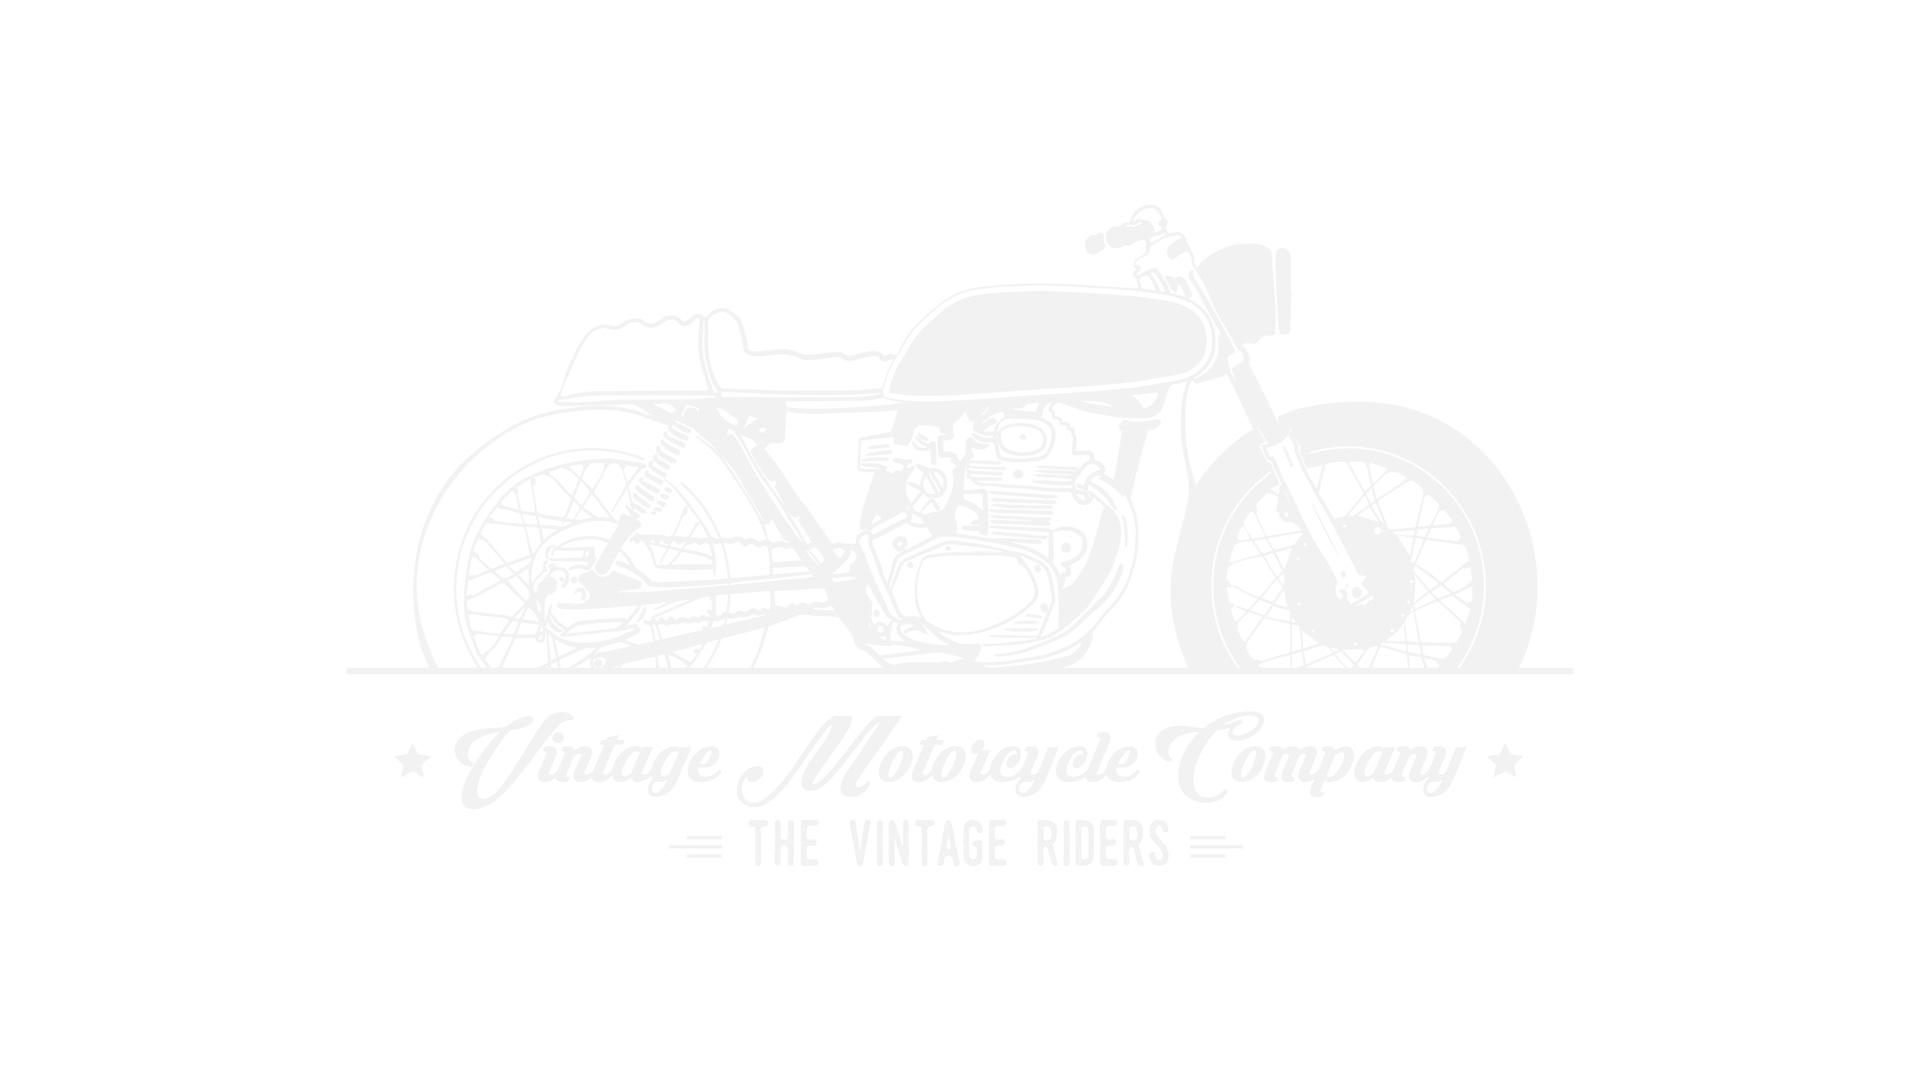 Vintage Motorcycle Company